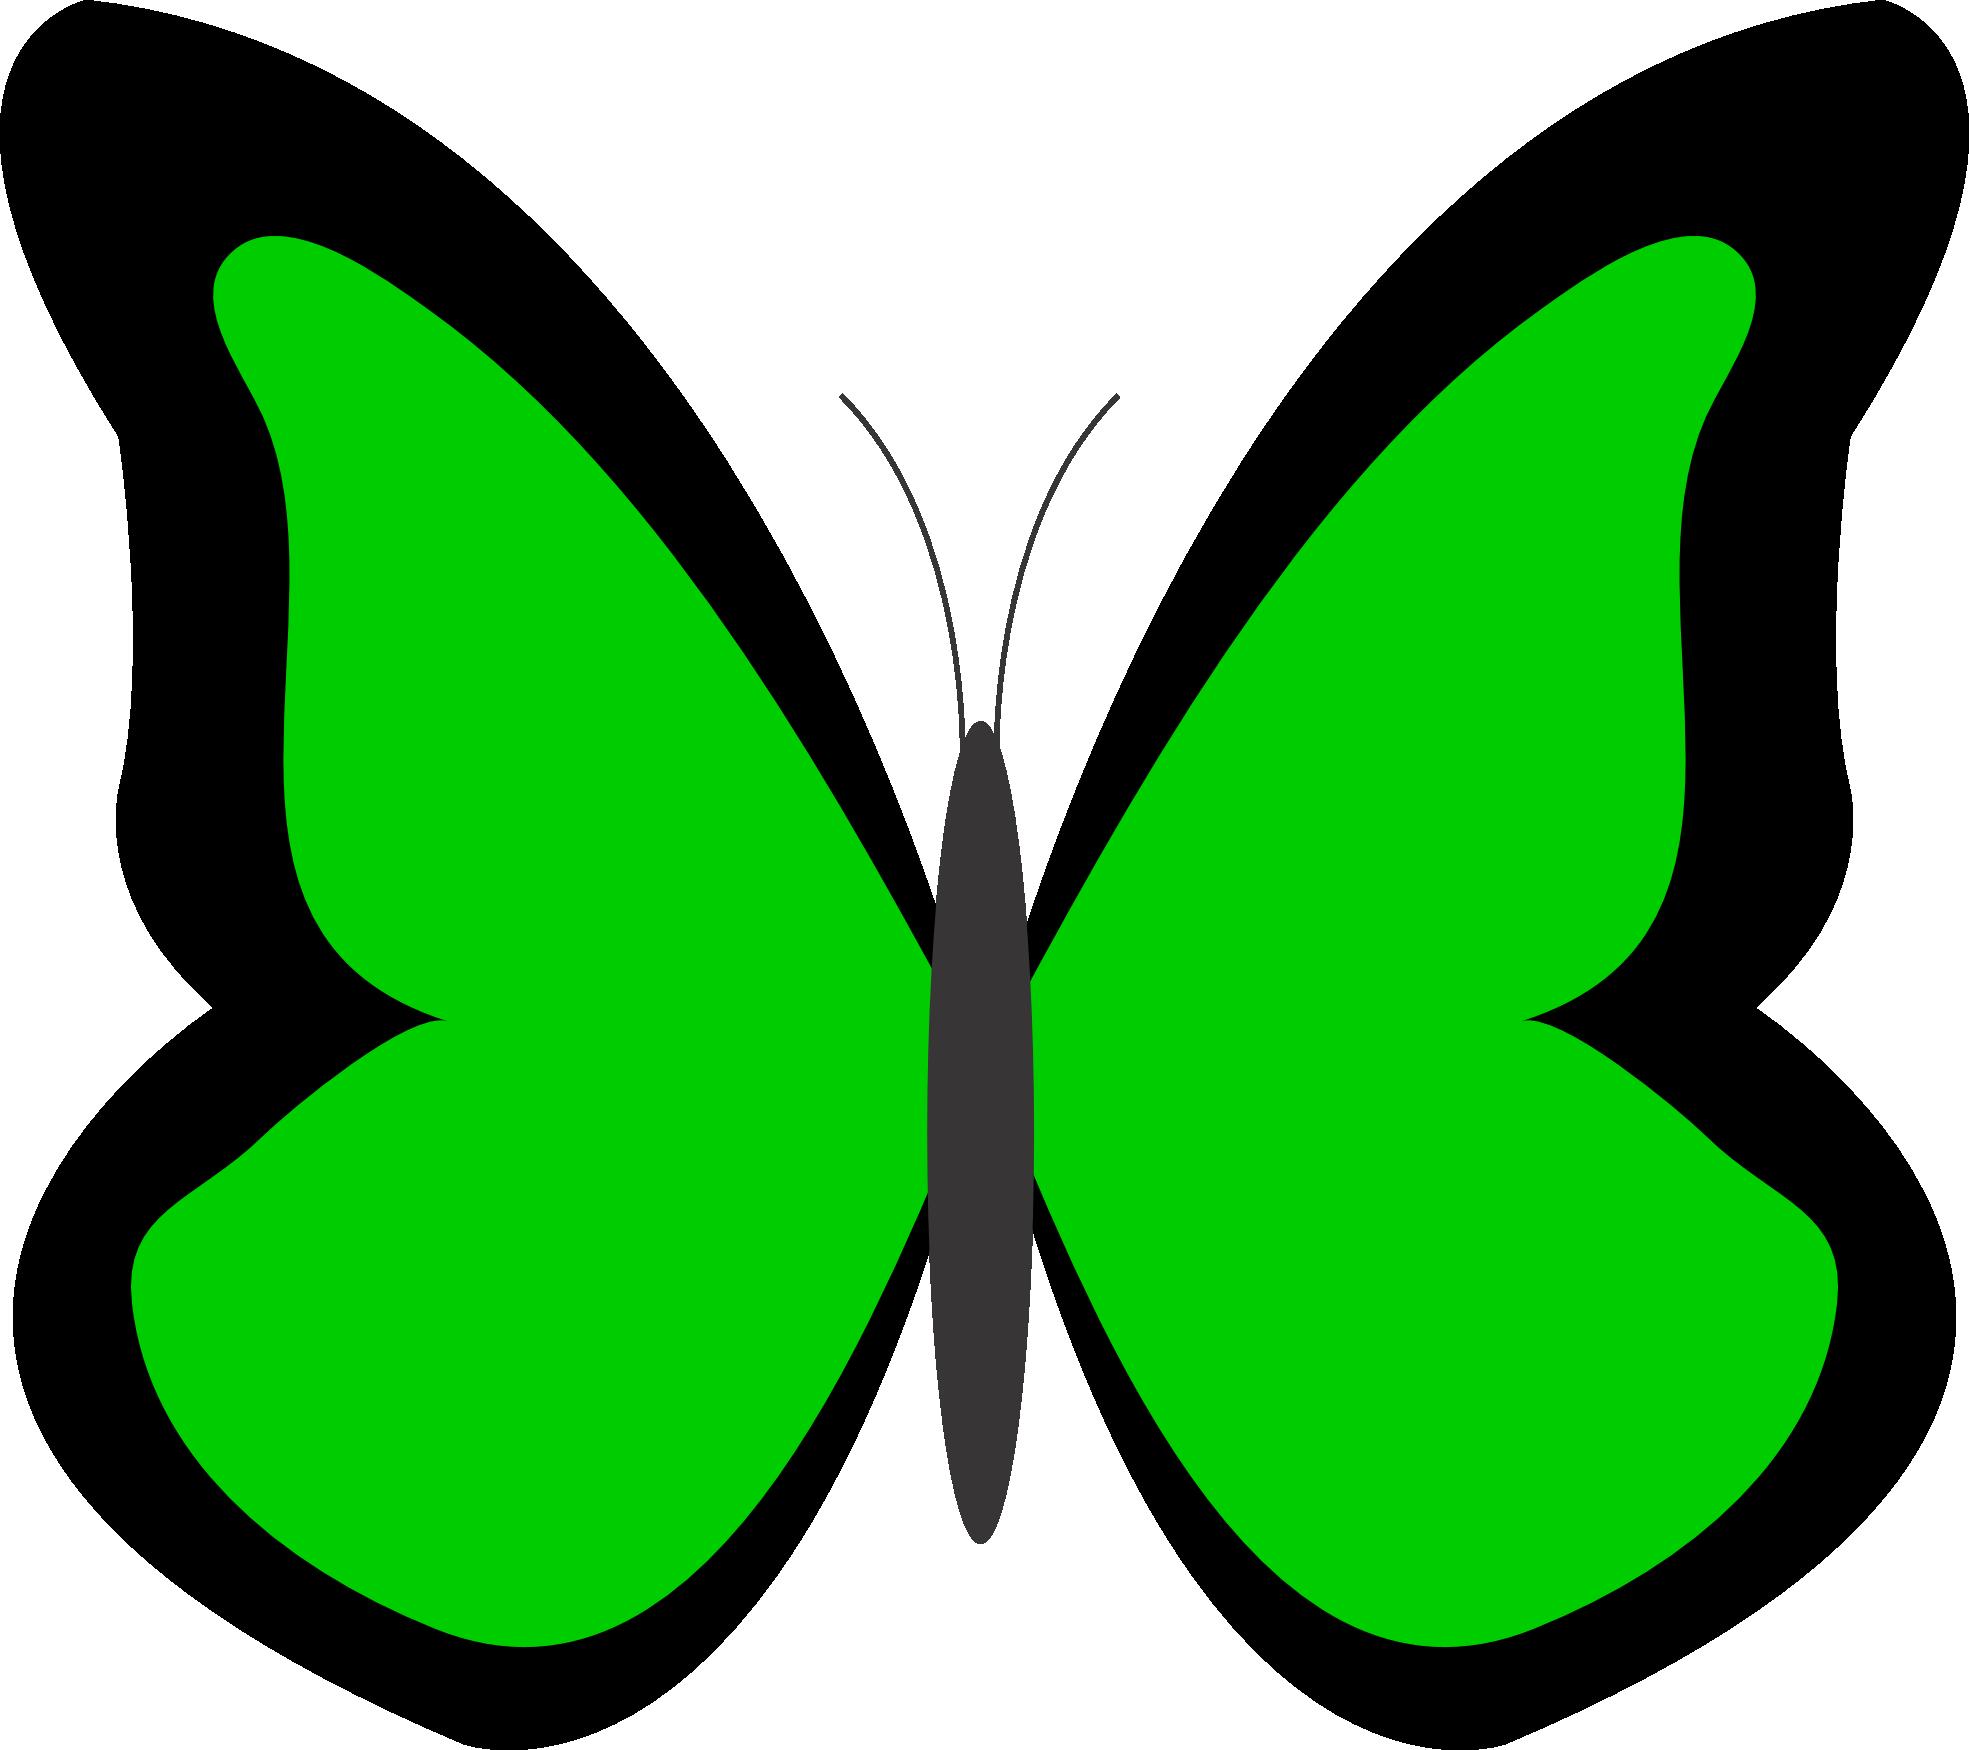 Crayons clipart big. Green butterfly panda free